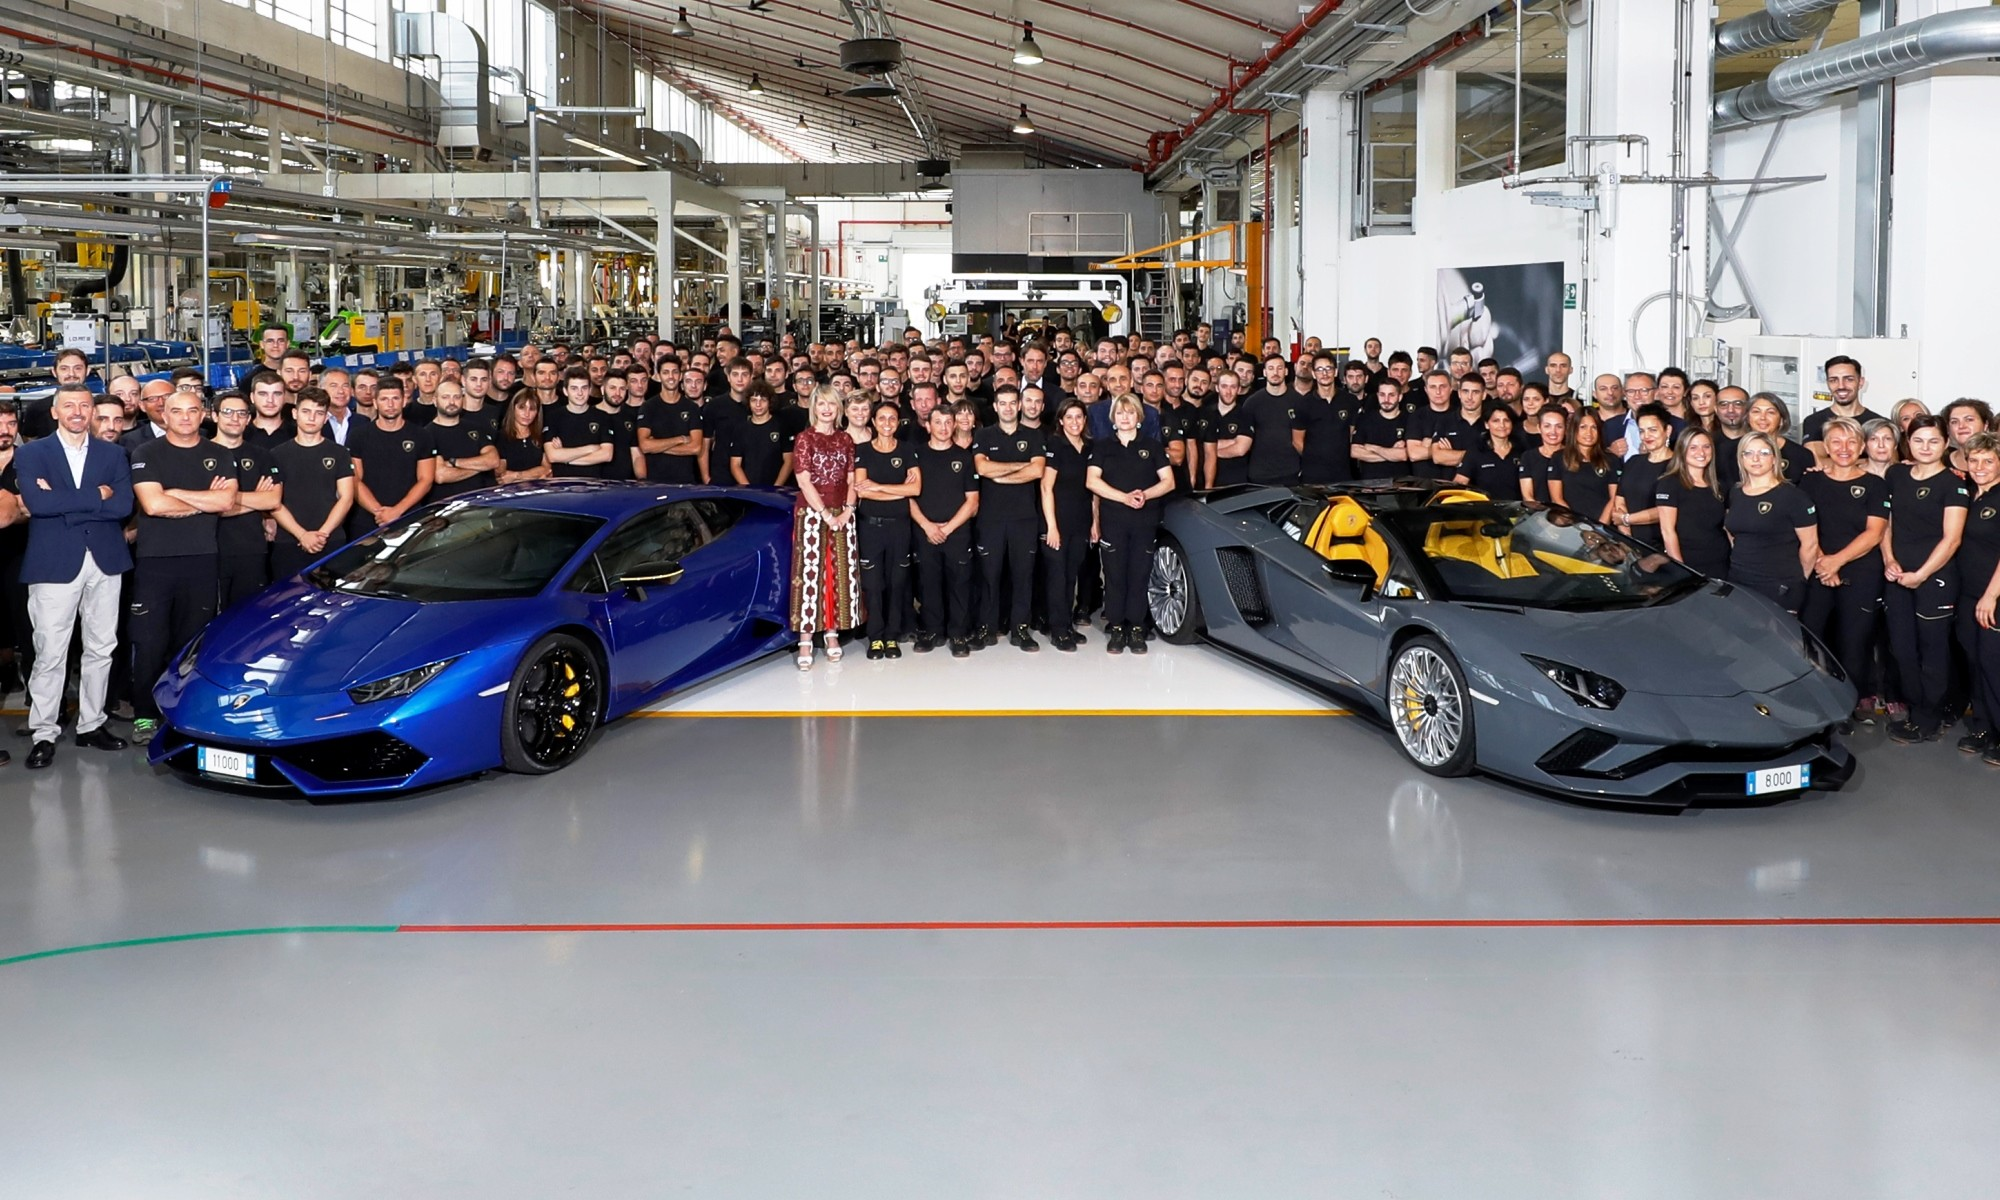 Lamborghini Aventador 8 000 and Huracan 11 000